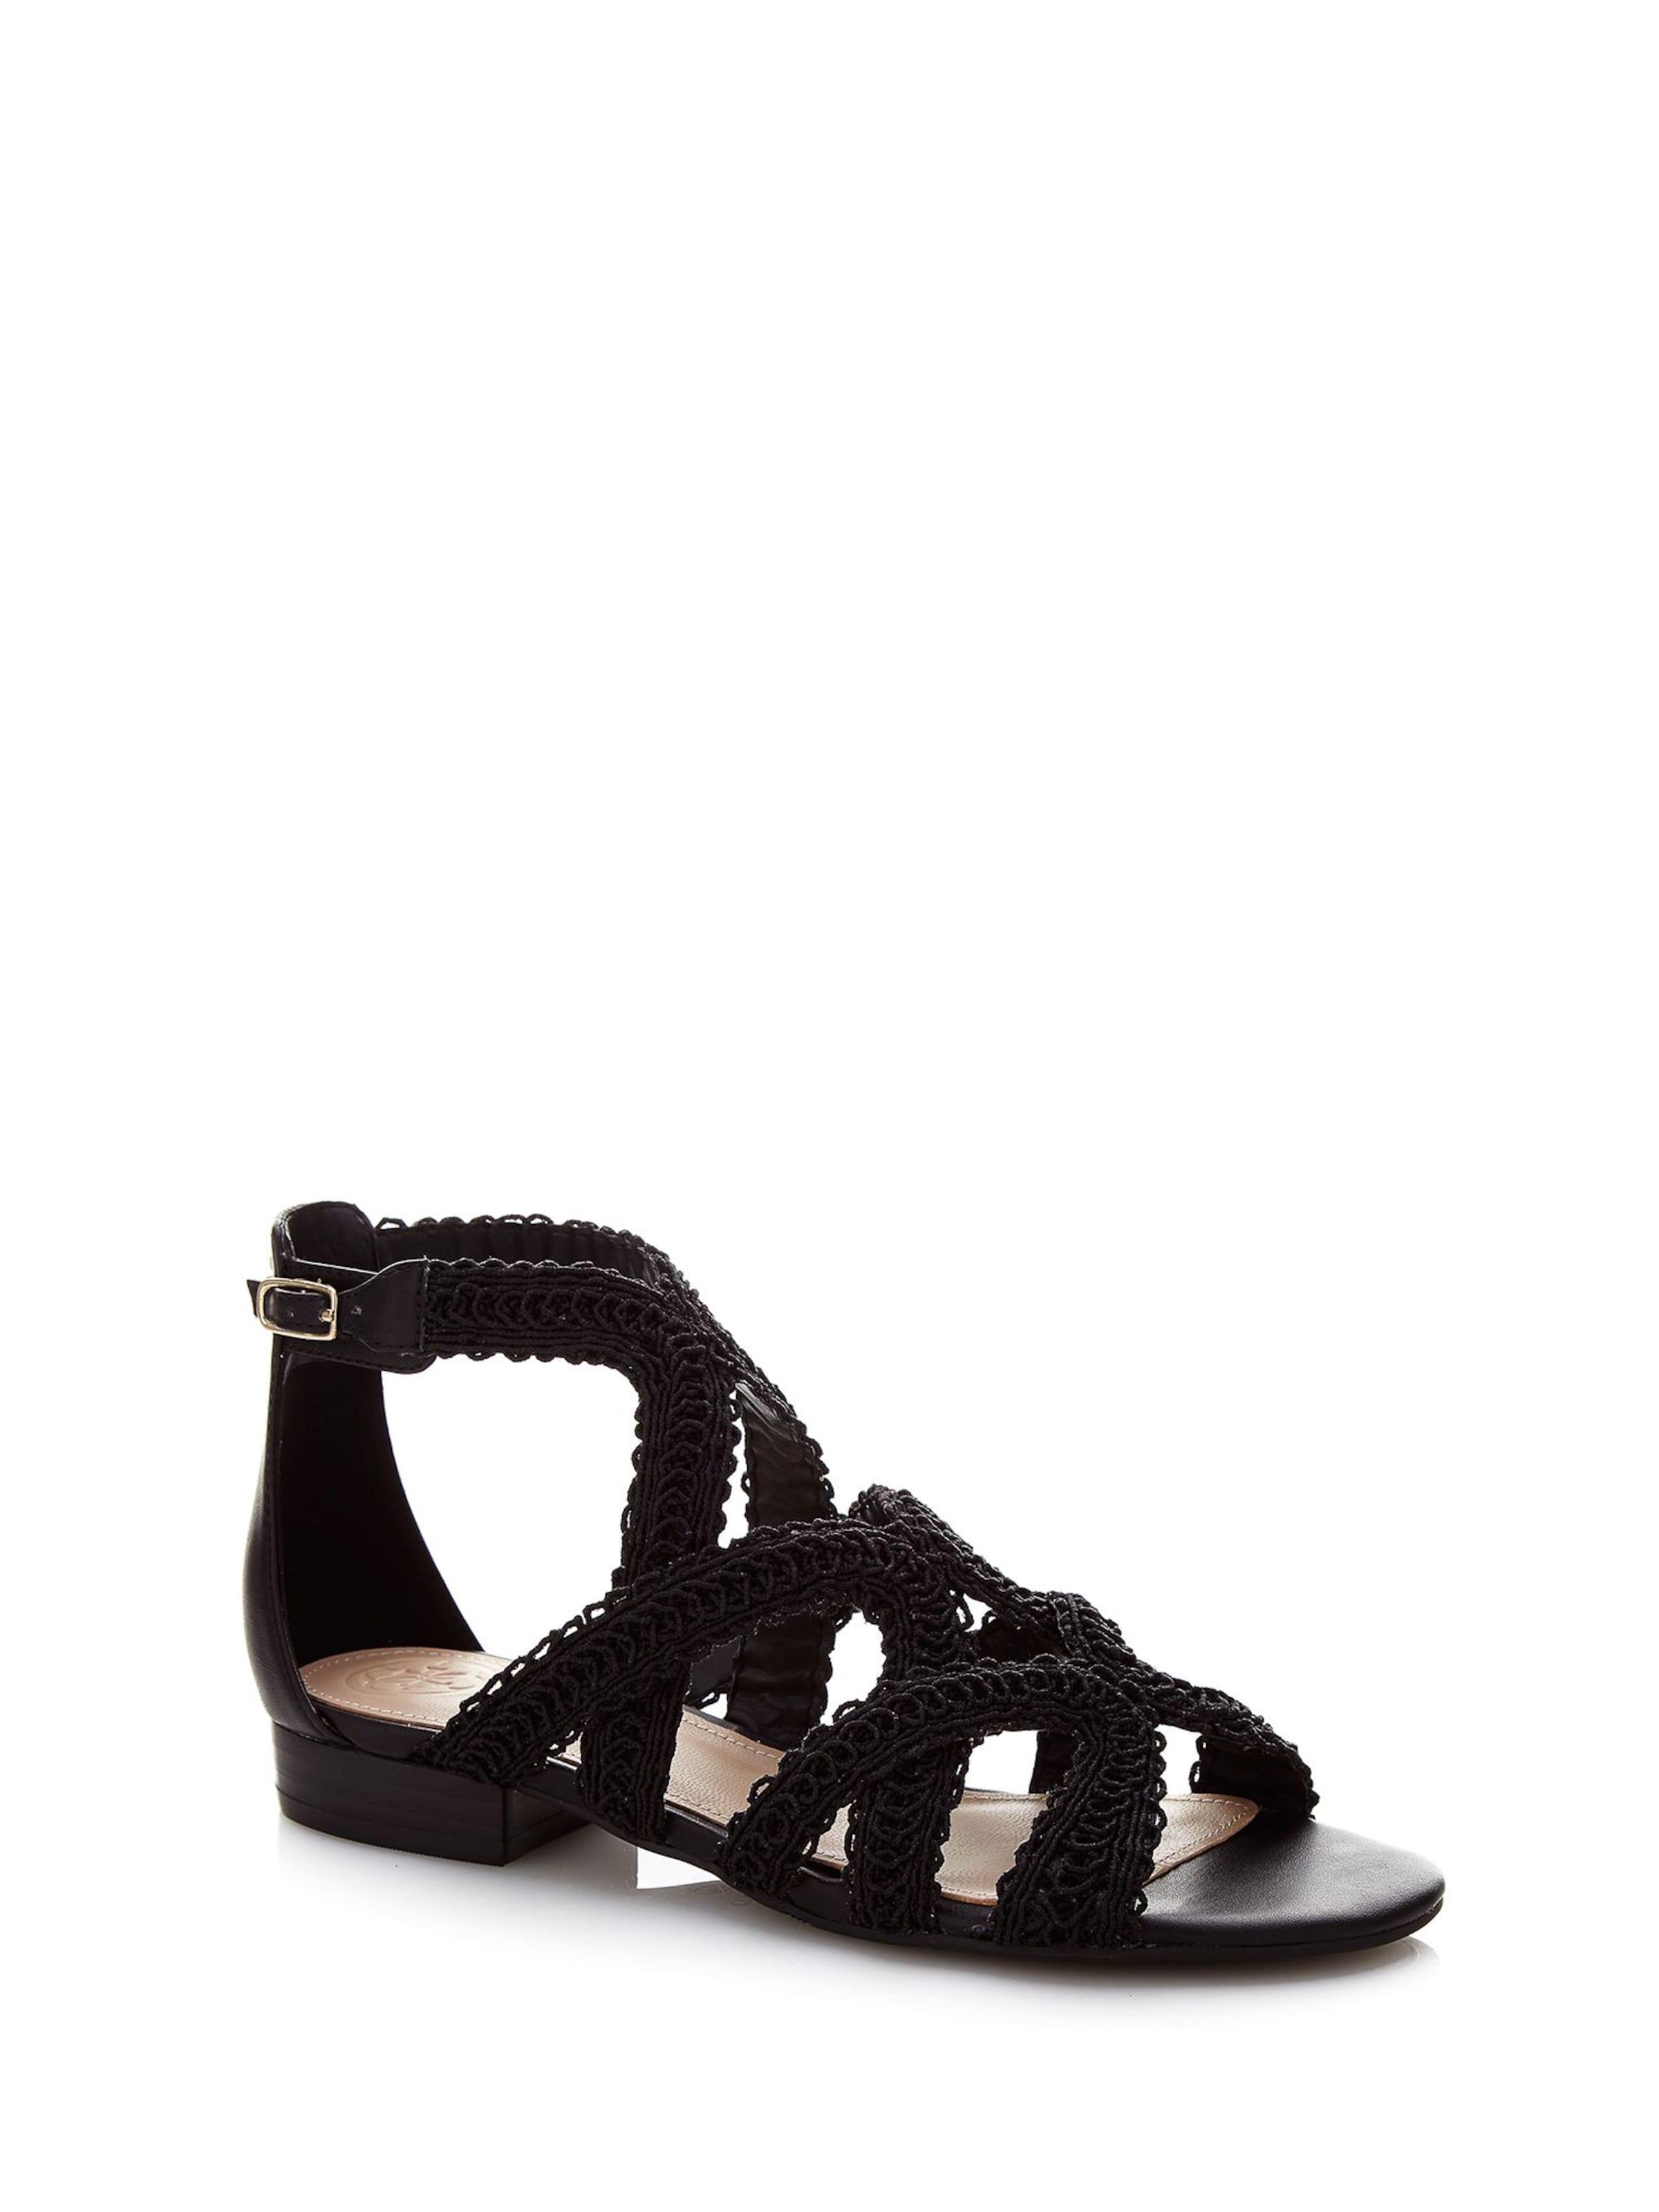 Haltbare Mode billige Schuhe GUESS | SANDALE 'DARIO' Schuhe Gut getragene Schuhe